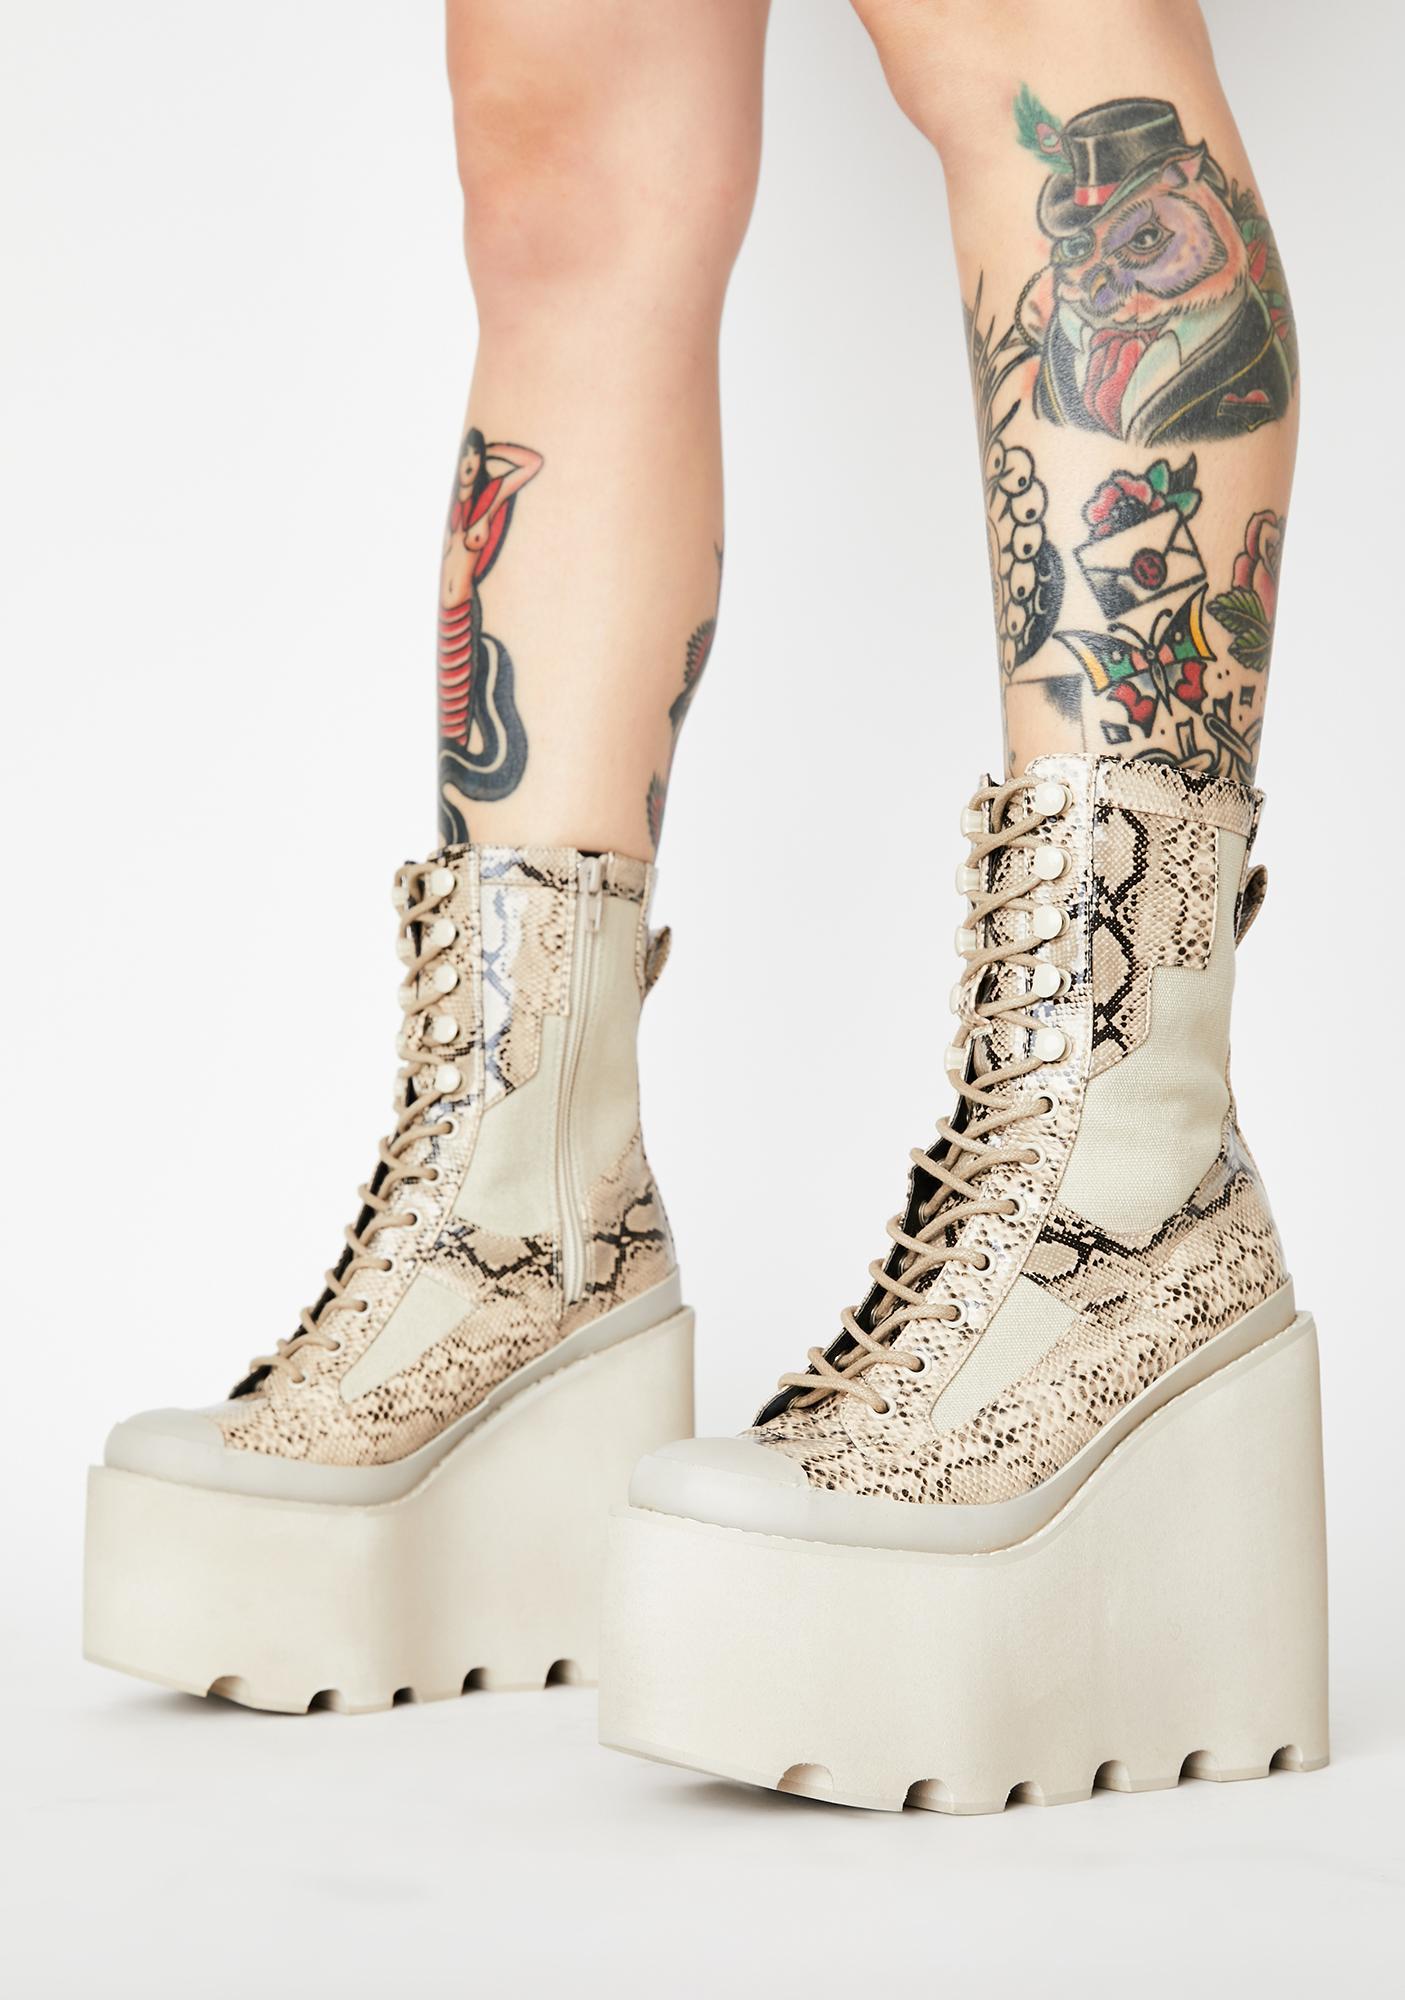 Club Exx Toxic Field Girl Traitor Boots